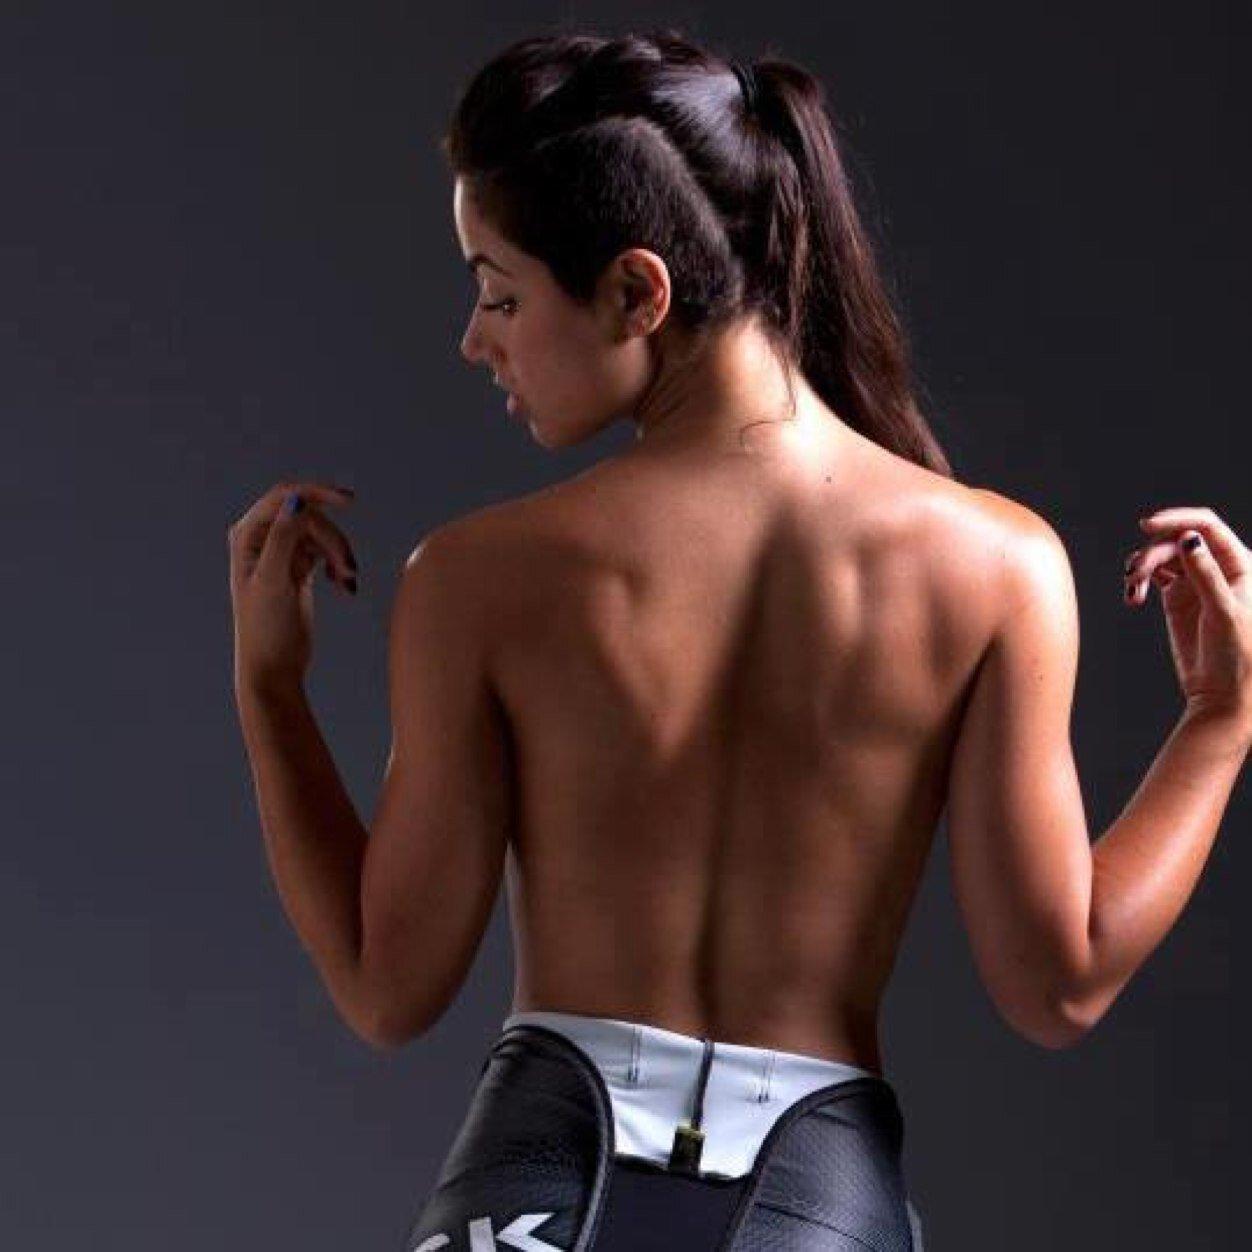 Alicia keys desnuda images 19